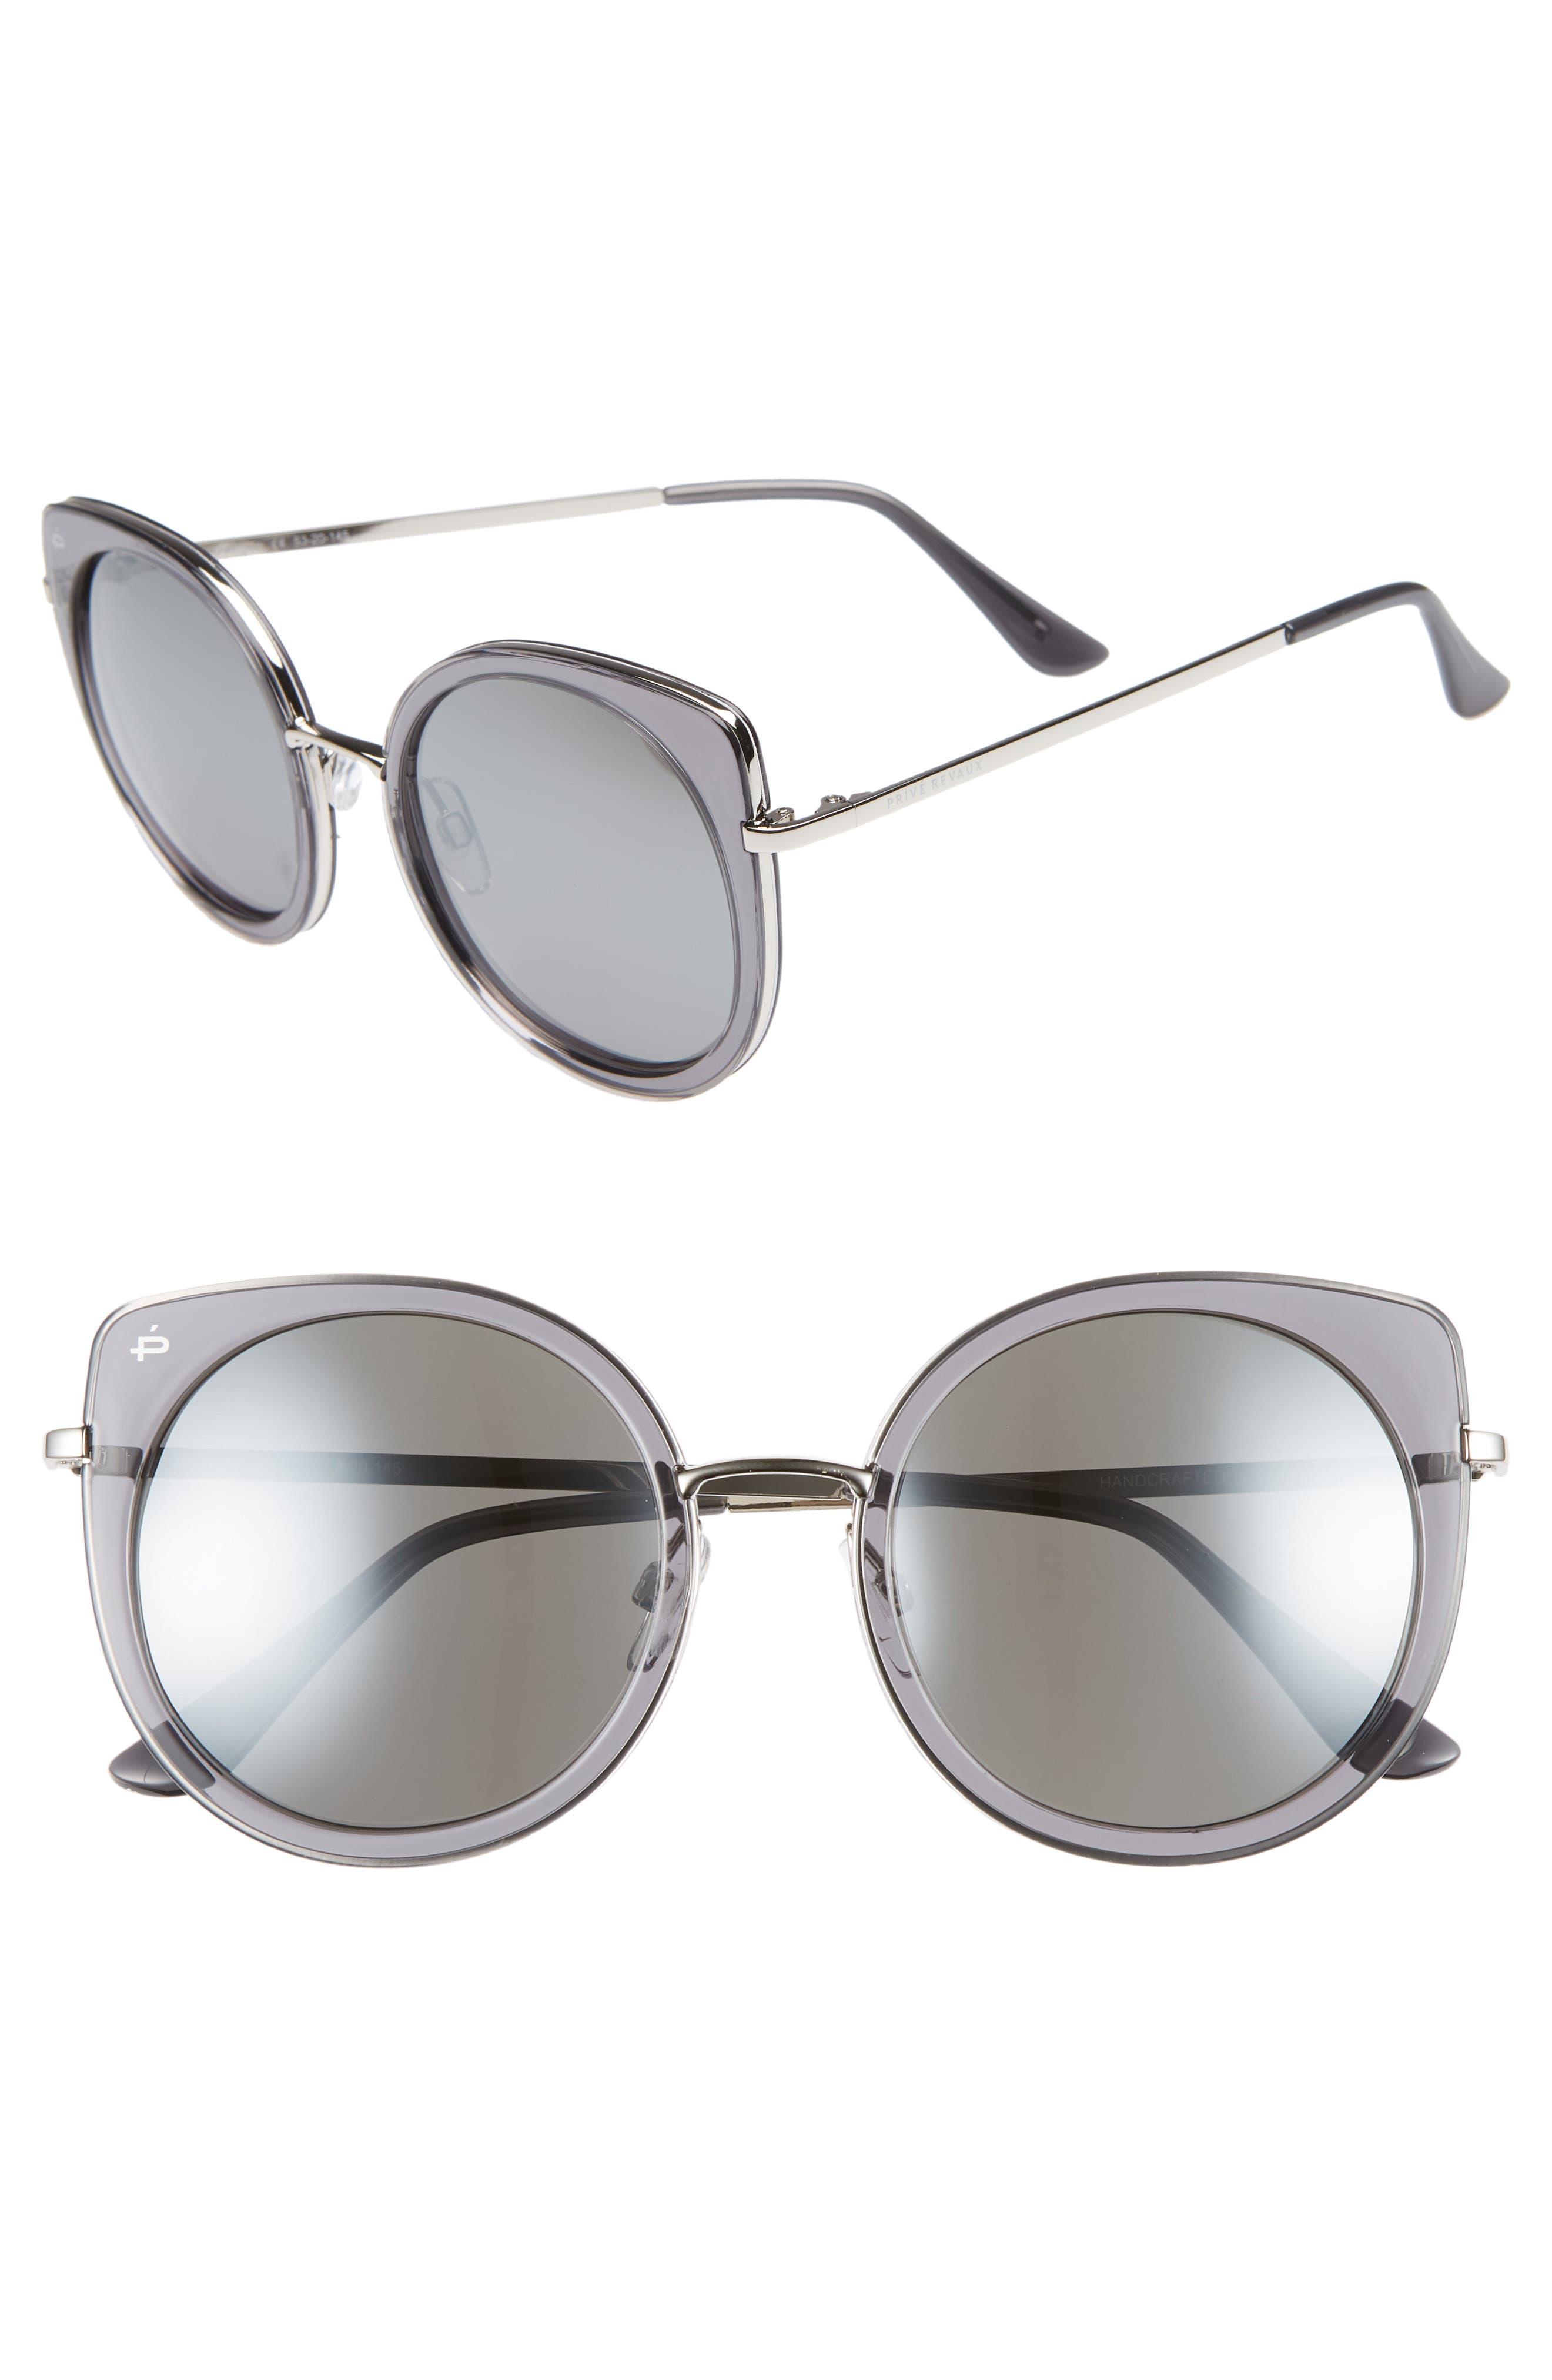 Privé Revaux The Georgian 53mm Sunglasses,                         Main,                         color, CRYSTAL SMOKE